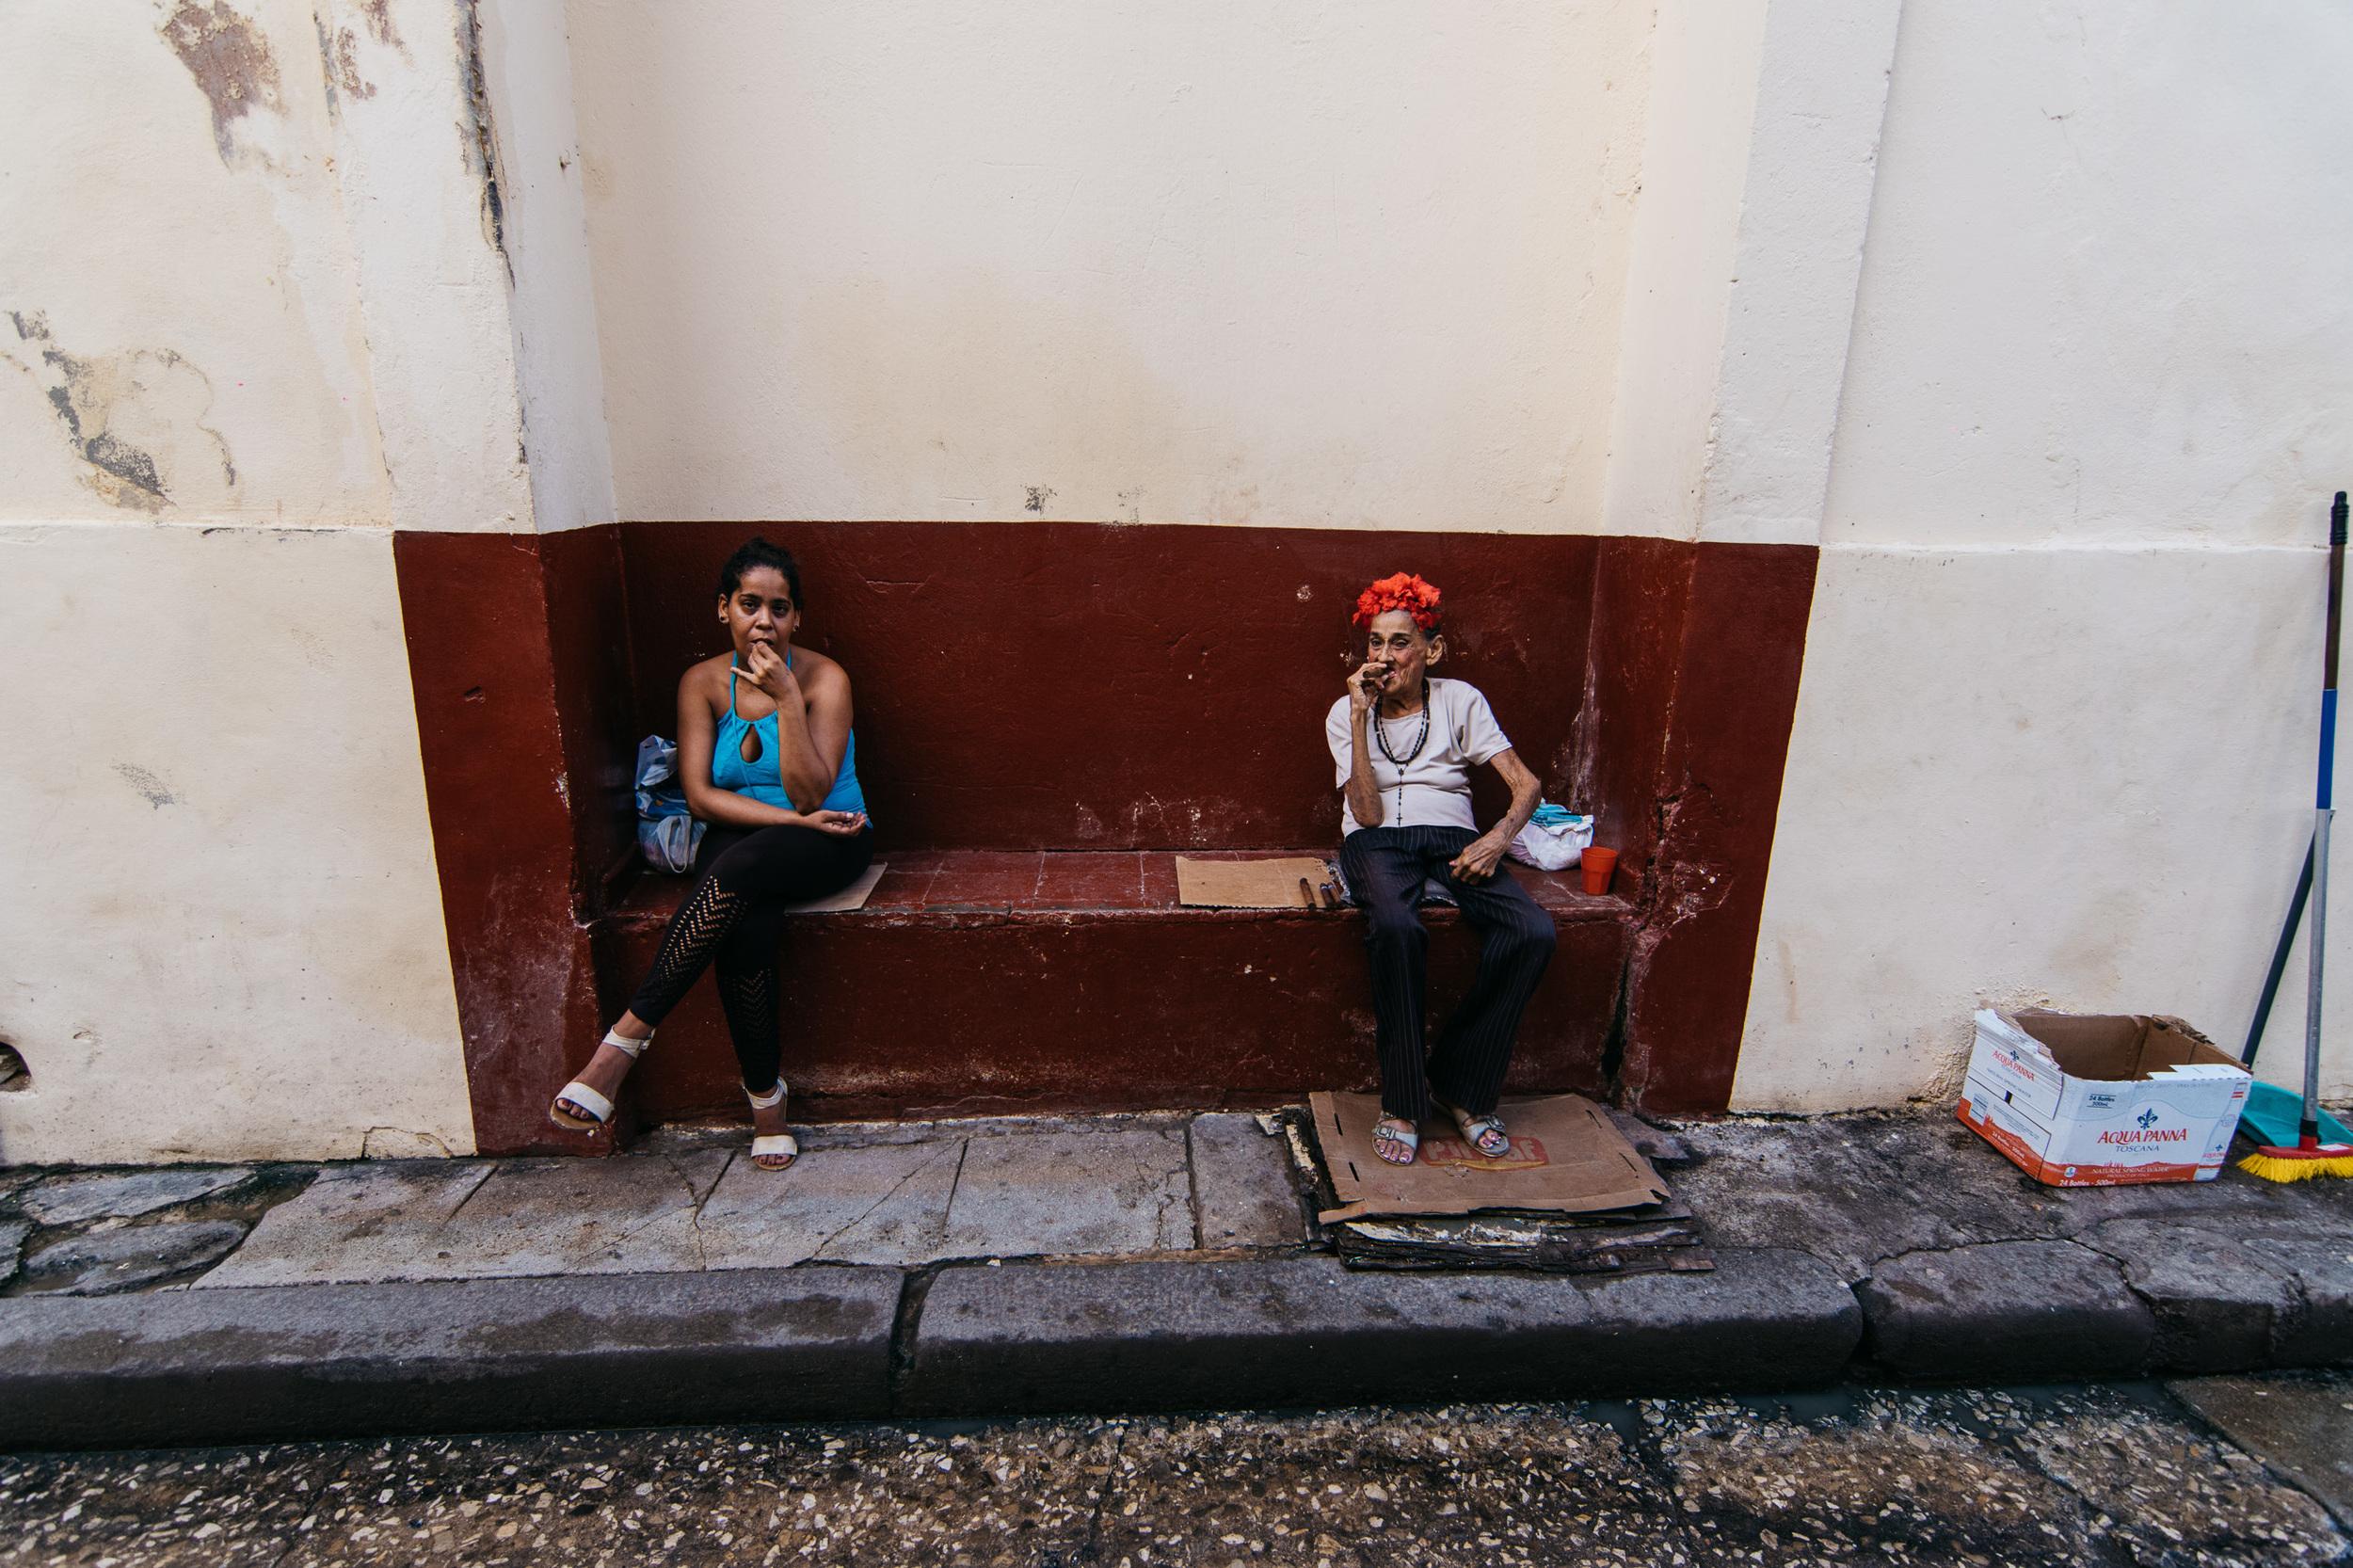 DeClaro-Photography-Cuba-02257.jpg